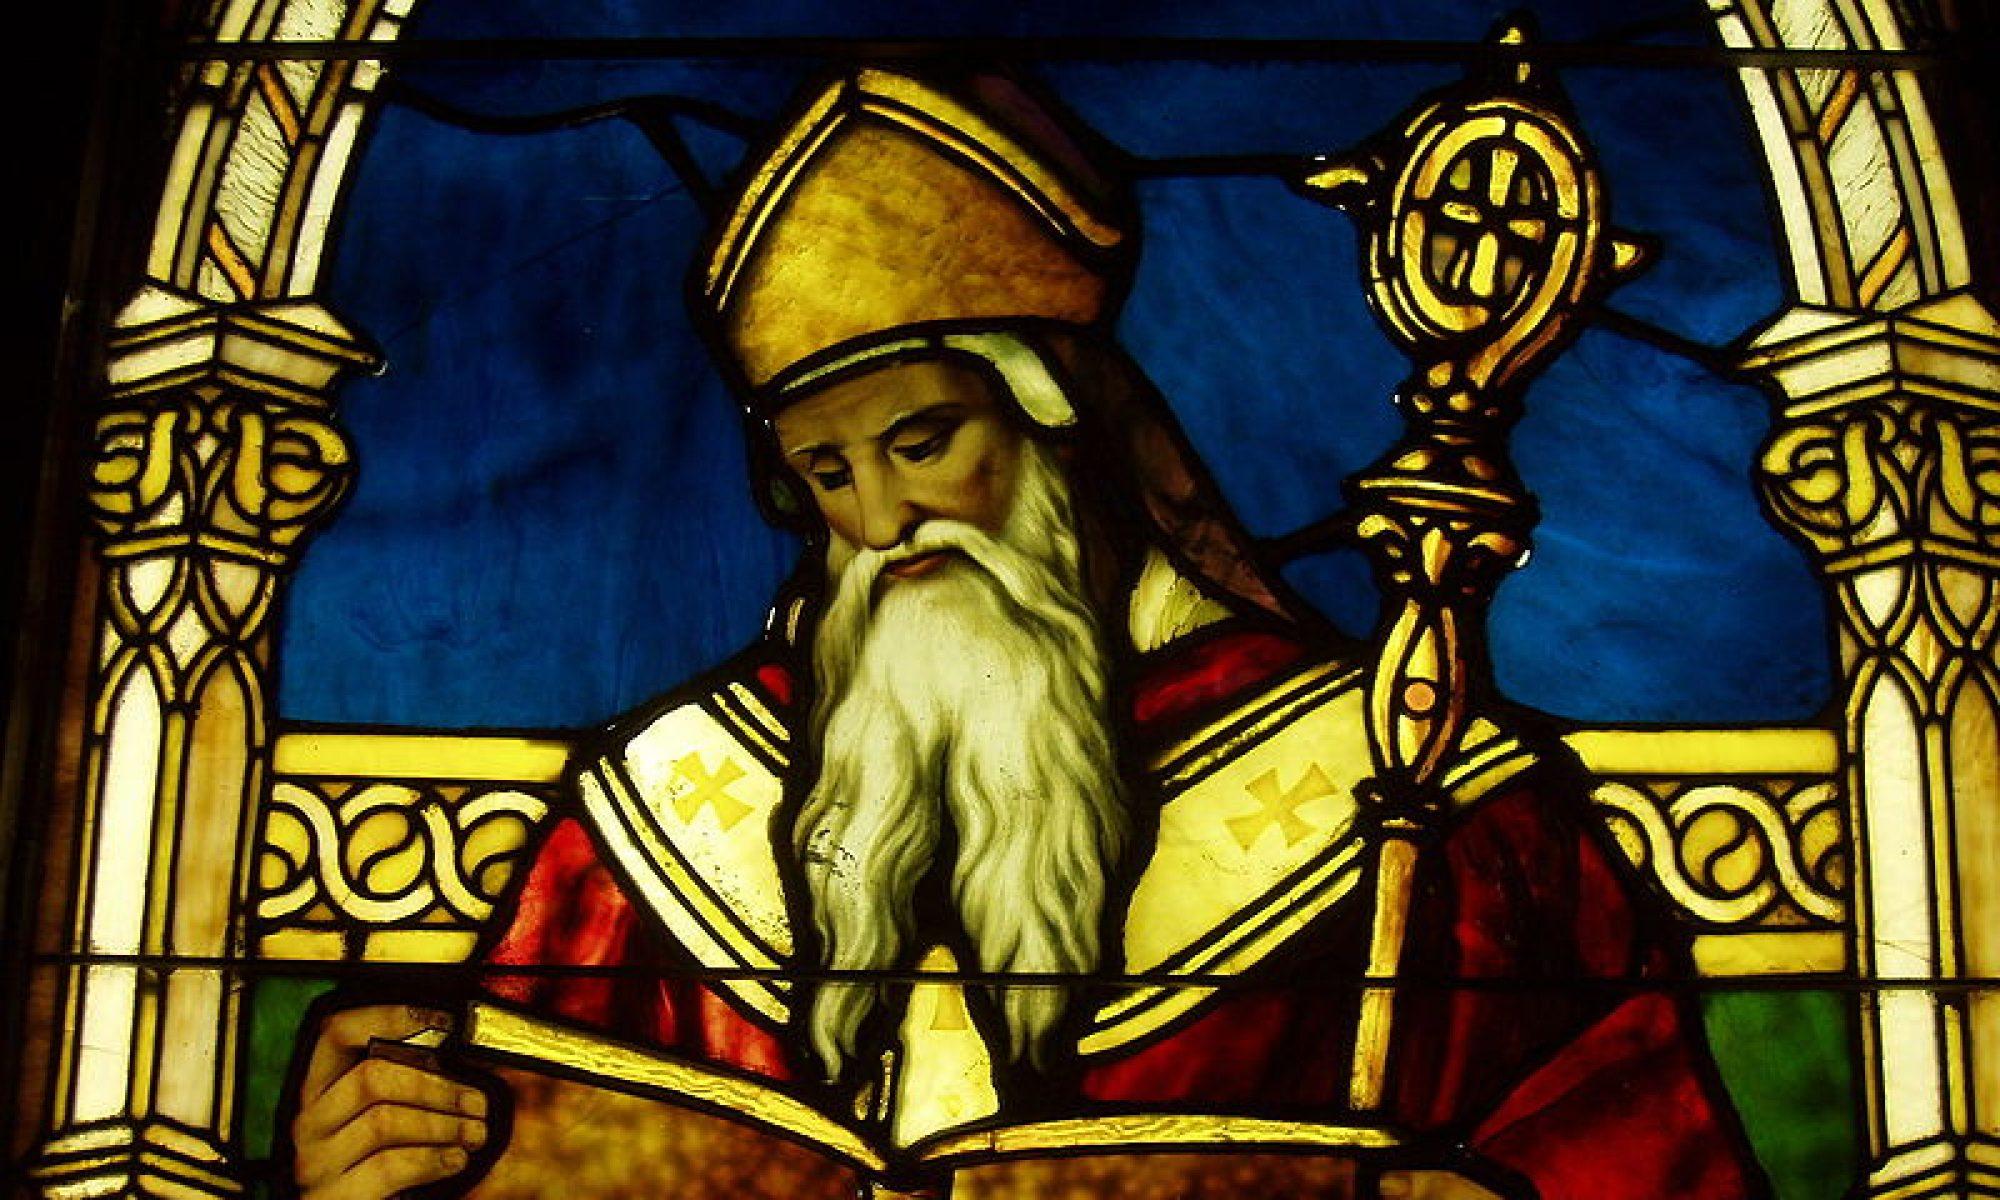 Episcopal Bishop Searches